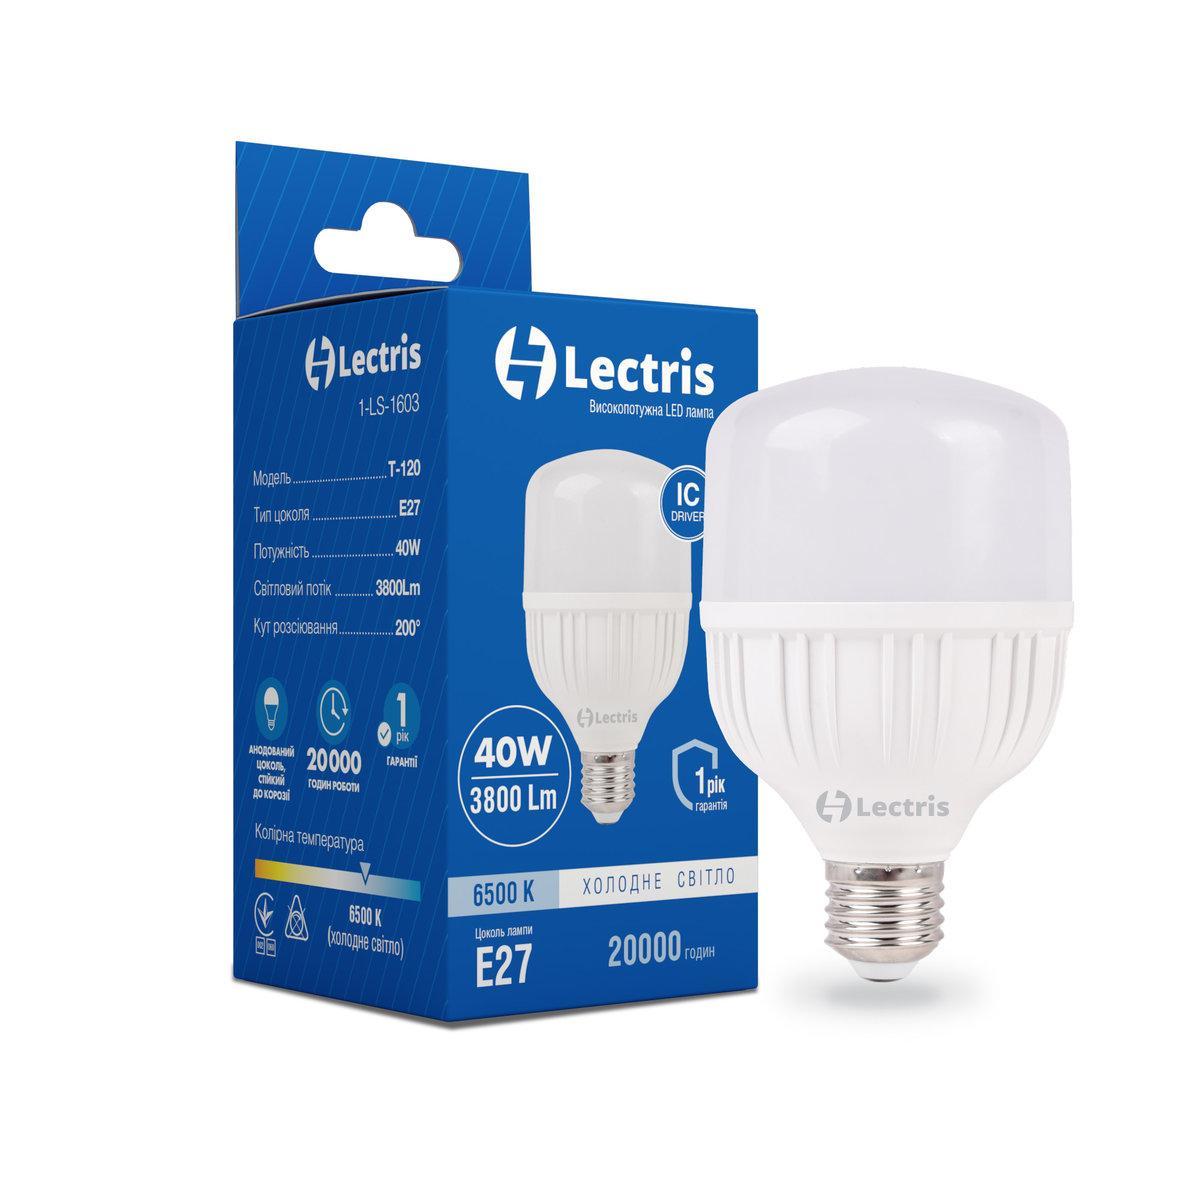 Лампа LEDT120 40W 6500K 220V E27 LECTRIS